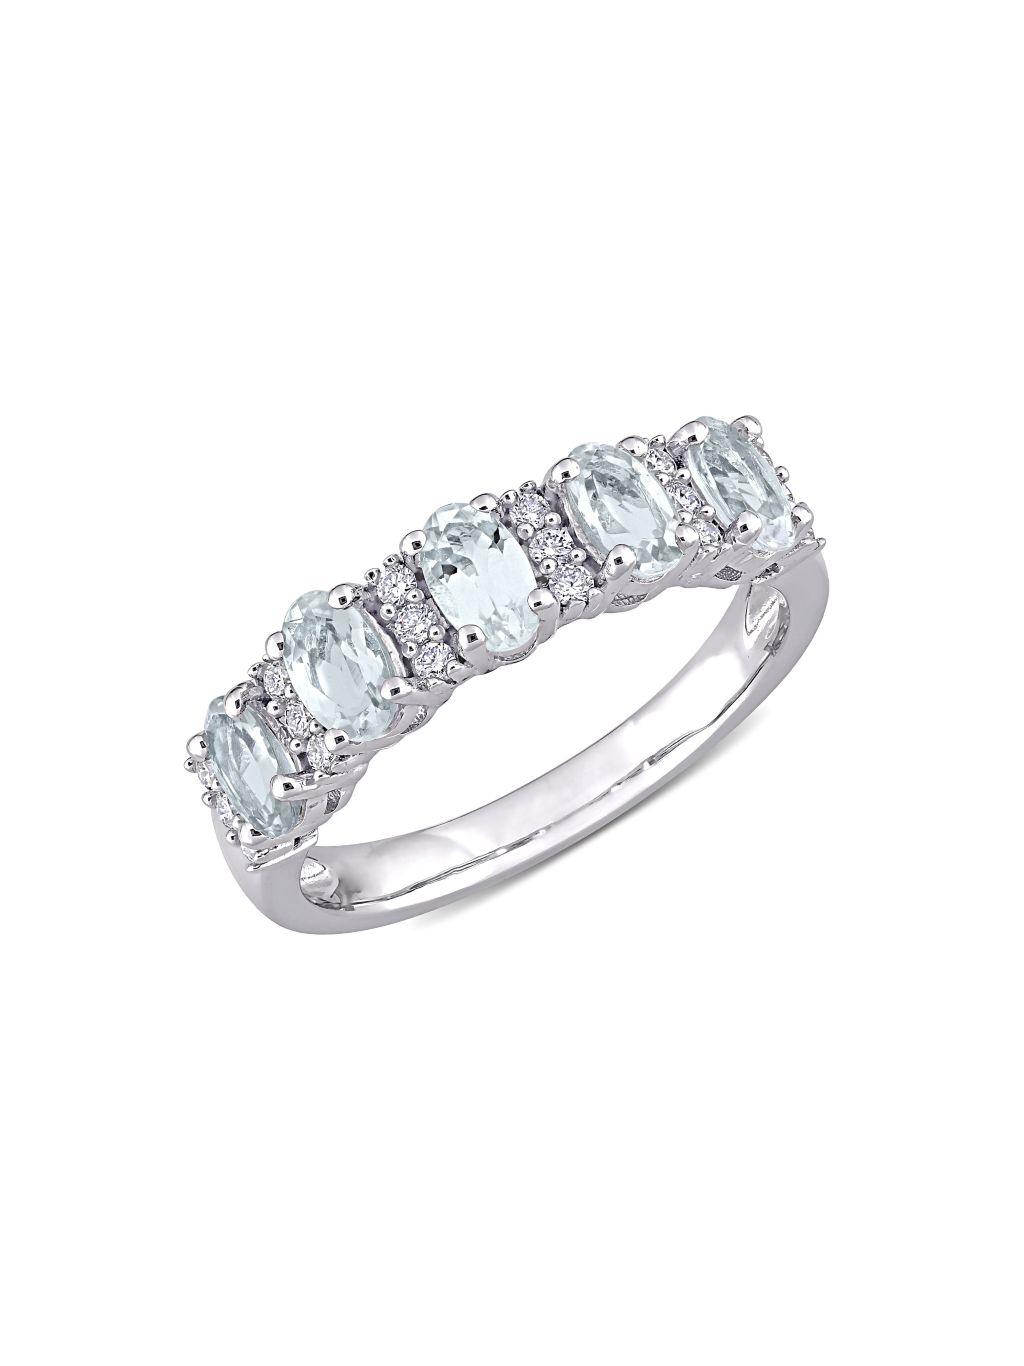 Saks Fifth Avenue 14K White Gold, Oval-Cut Aquamarine & Round-Cut Diamond Semi-Eternity Band Ring